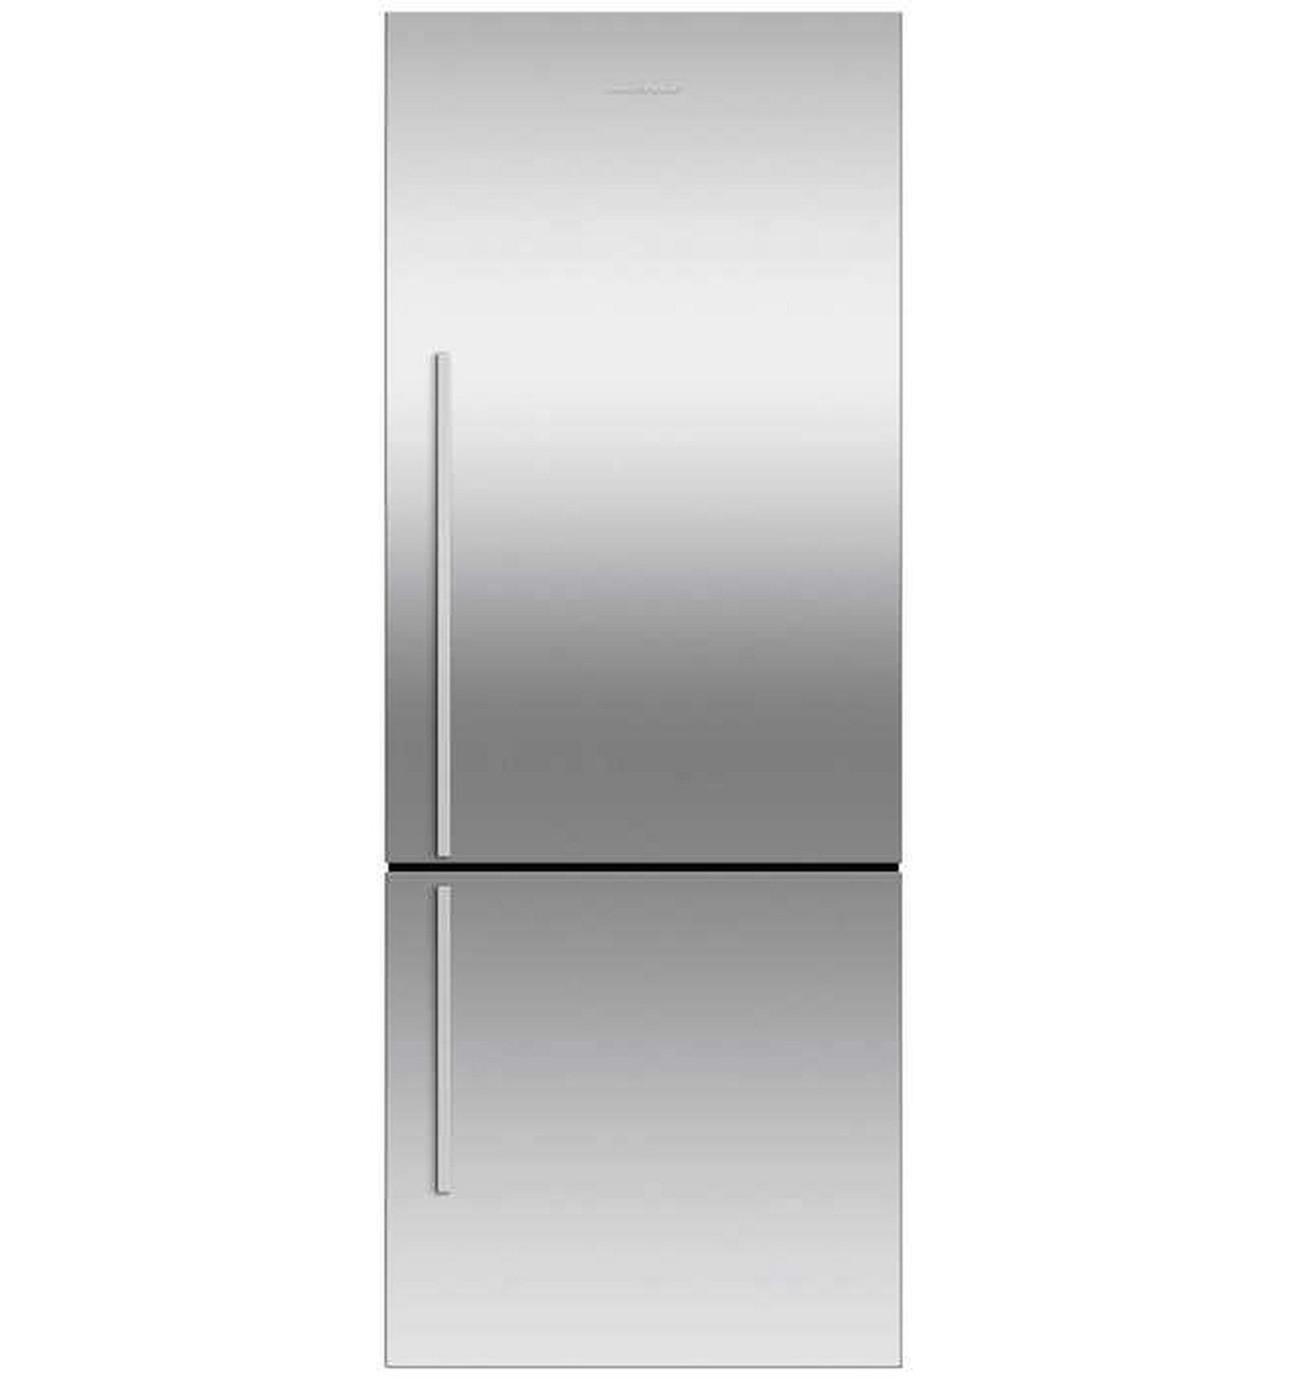 e402brxfd5 403l bottom mount fridge